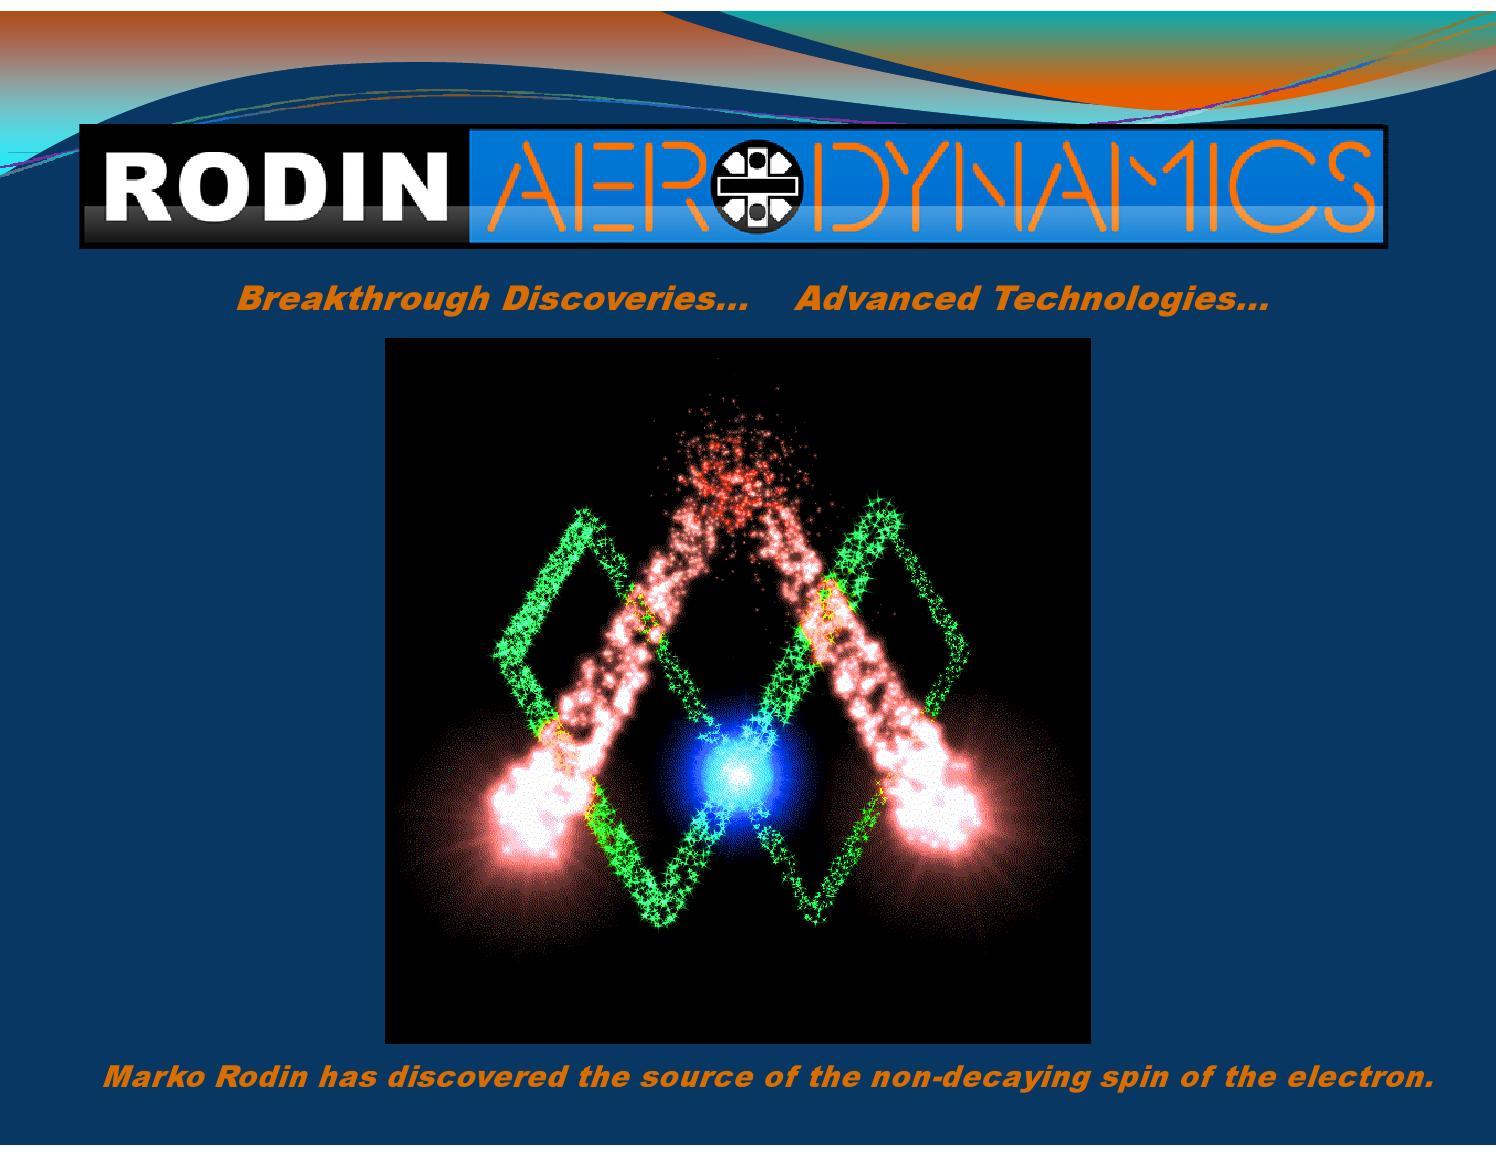 Rodin Coil Antenna Diagram Aerodynamics Presentation Science To Sage Issuu 1496x1156